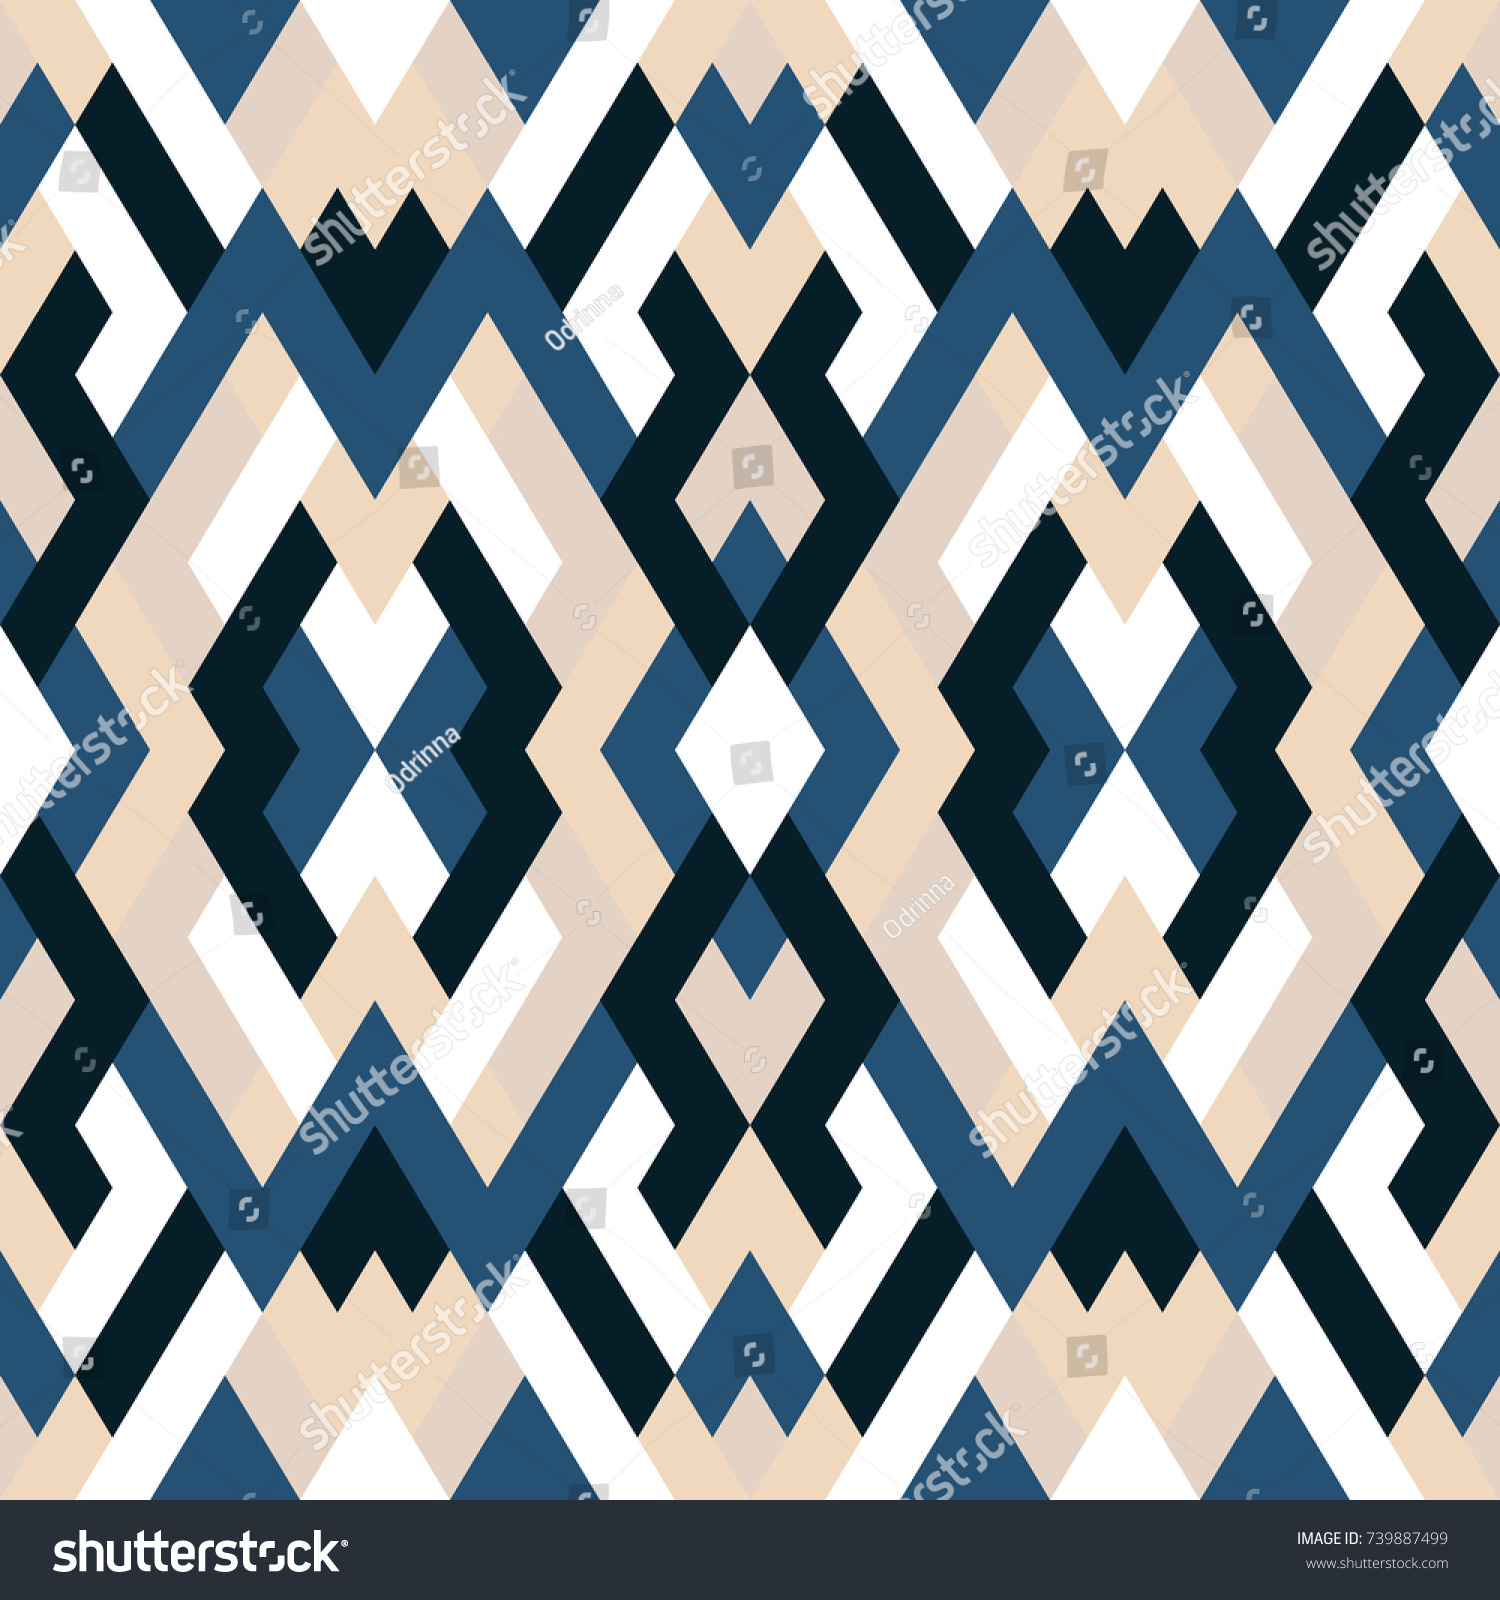 Mosaic Seamless Texture Vector Geometric Background Stock Vector